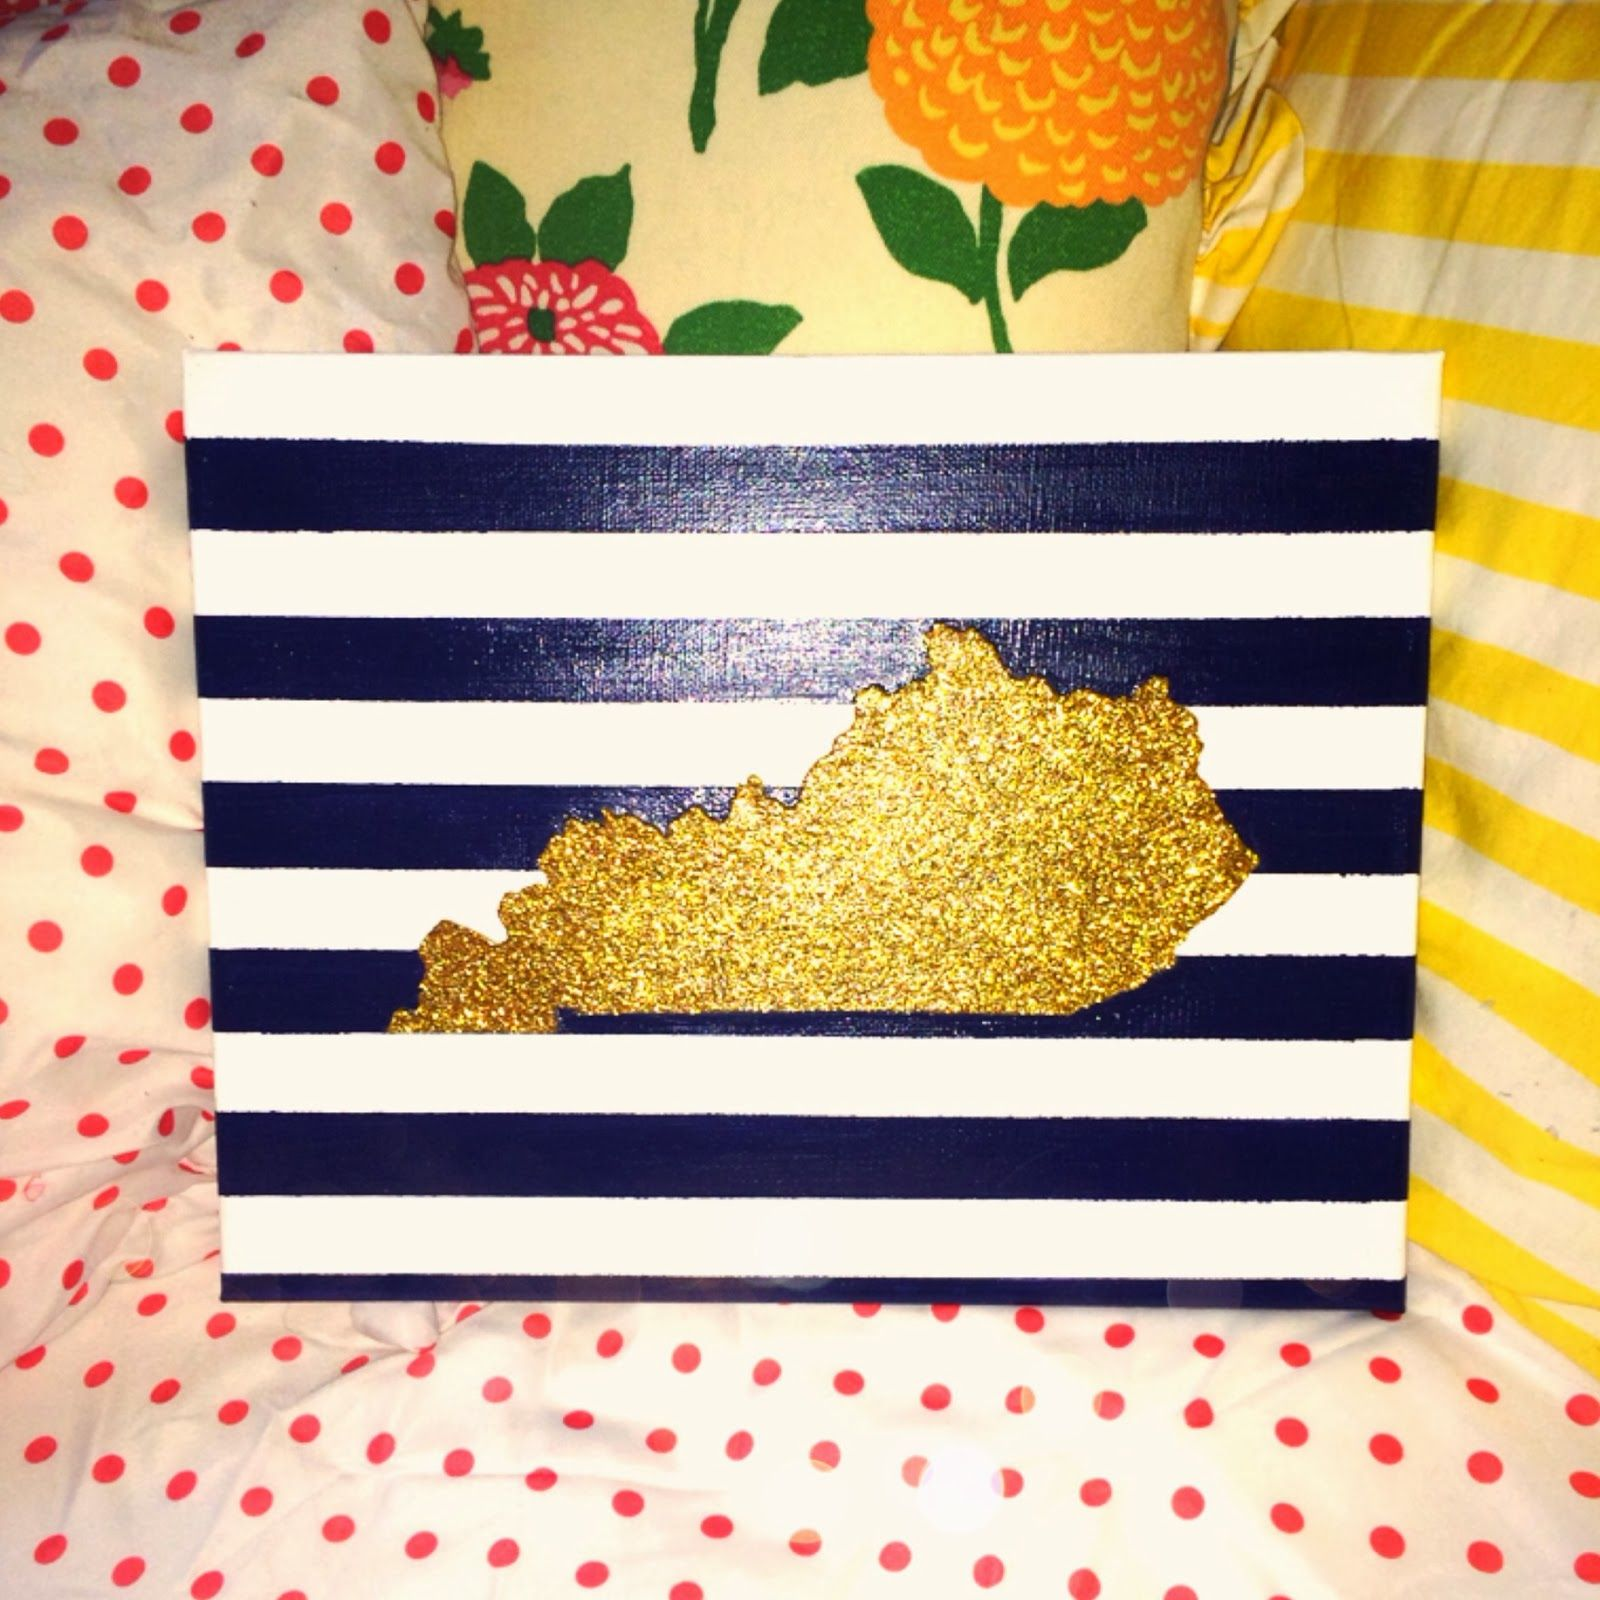 DIY glitter state - Kentucky and nautical stripes | DIY! | Pinterest ...